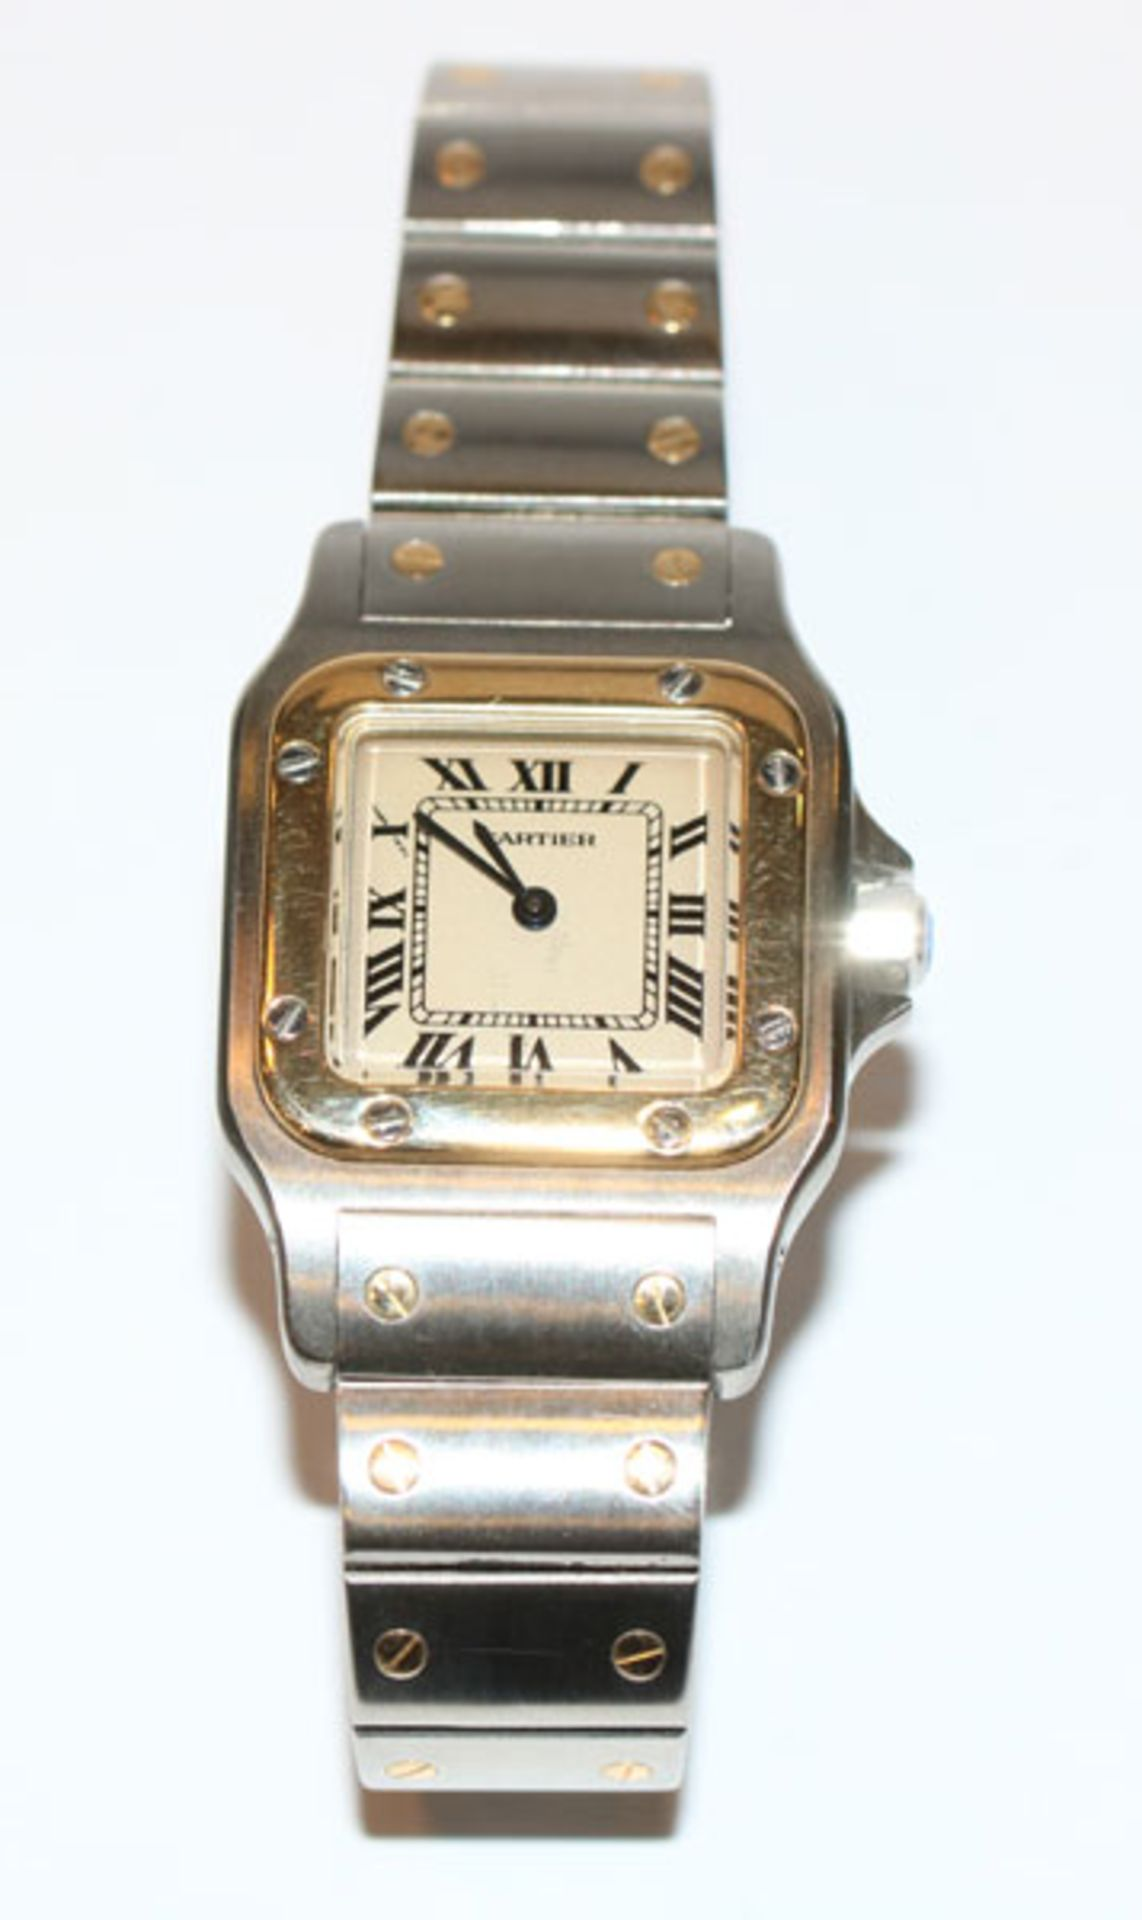 Cartier Damen-Armbanduhr, Santos Carrée, Edelstahl/Gelbgold, intakt, ohne Papiere, Tragespuren,